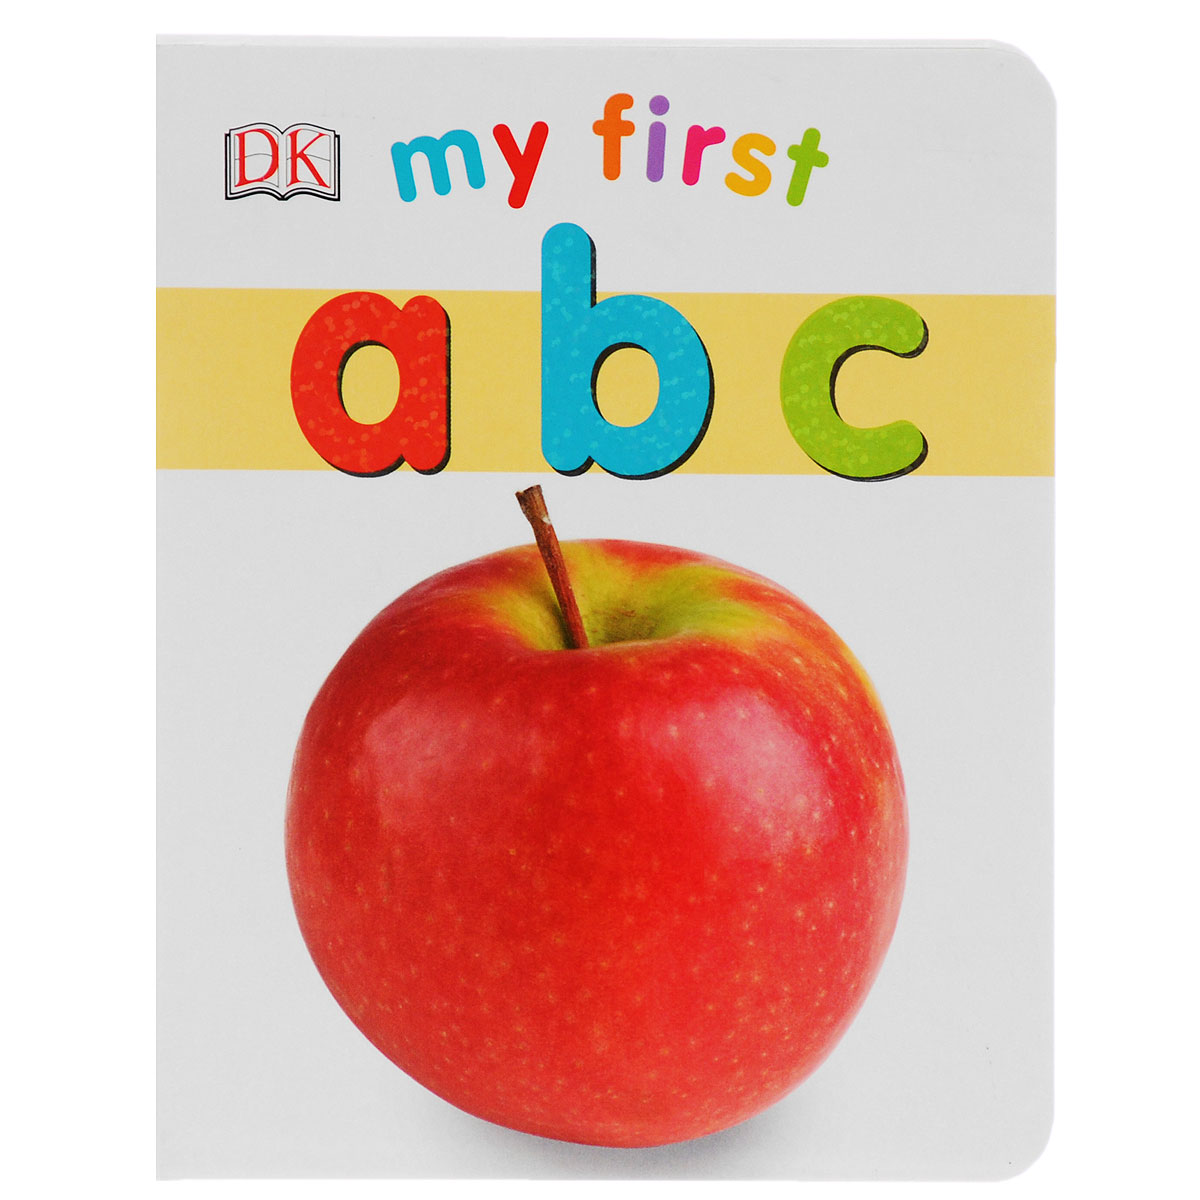 My First: A B C bernard valman abc of one to seven